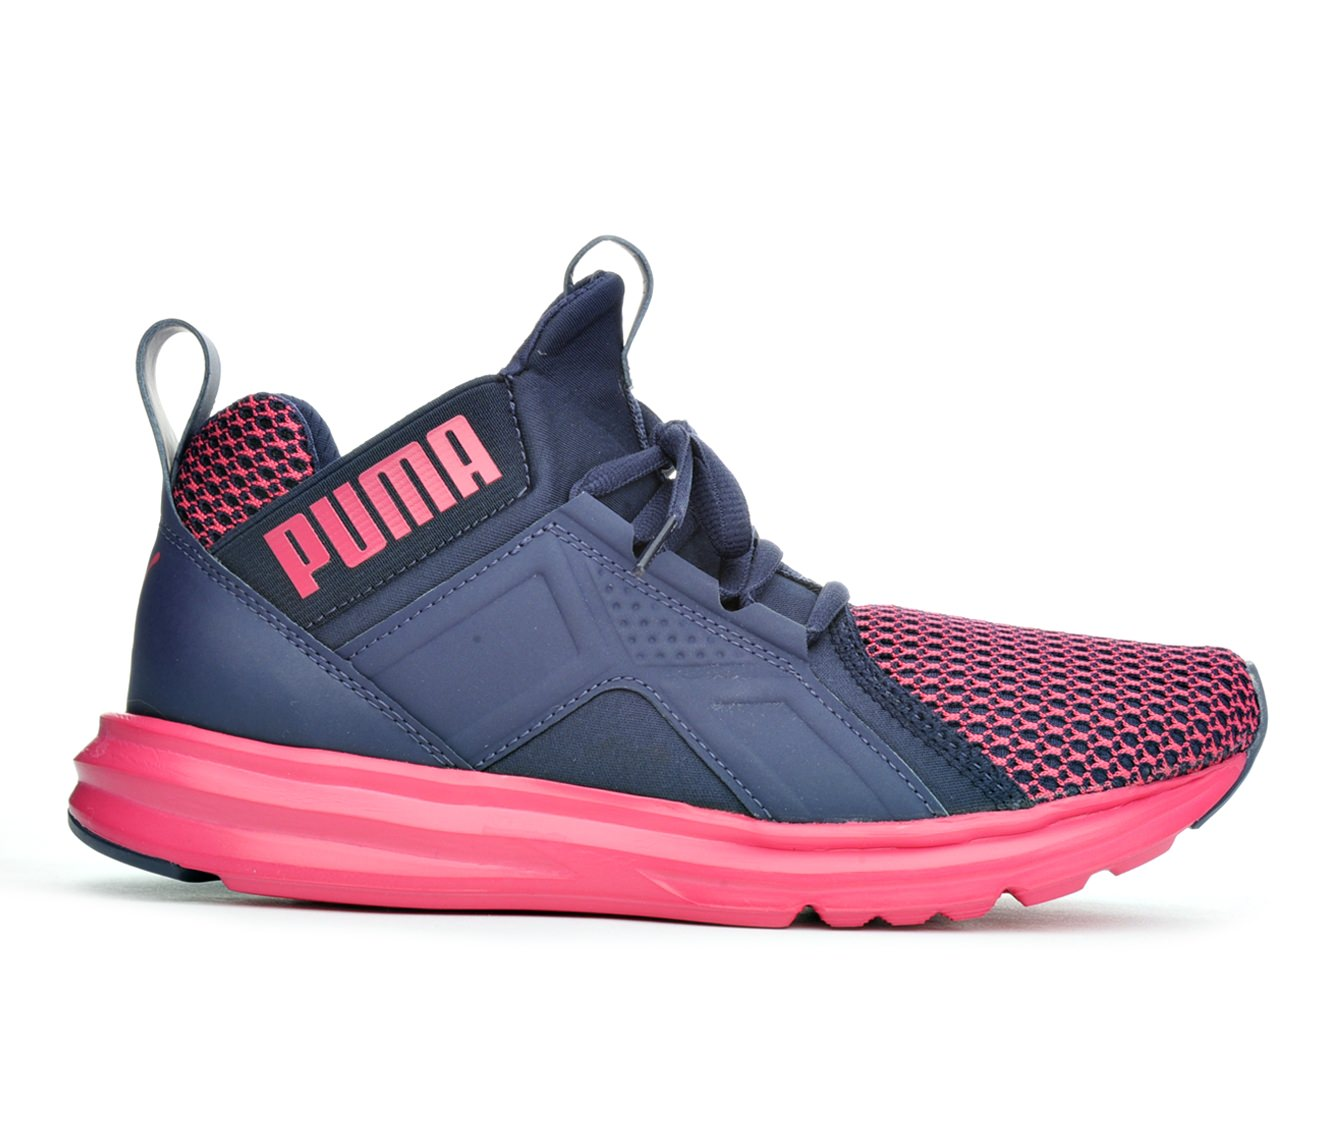 Women's Puma Enzo Shift Sneakers (Blue - Size 9.5) 1650155